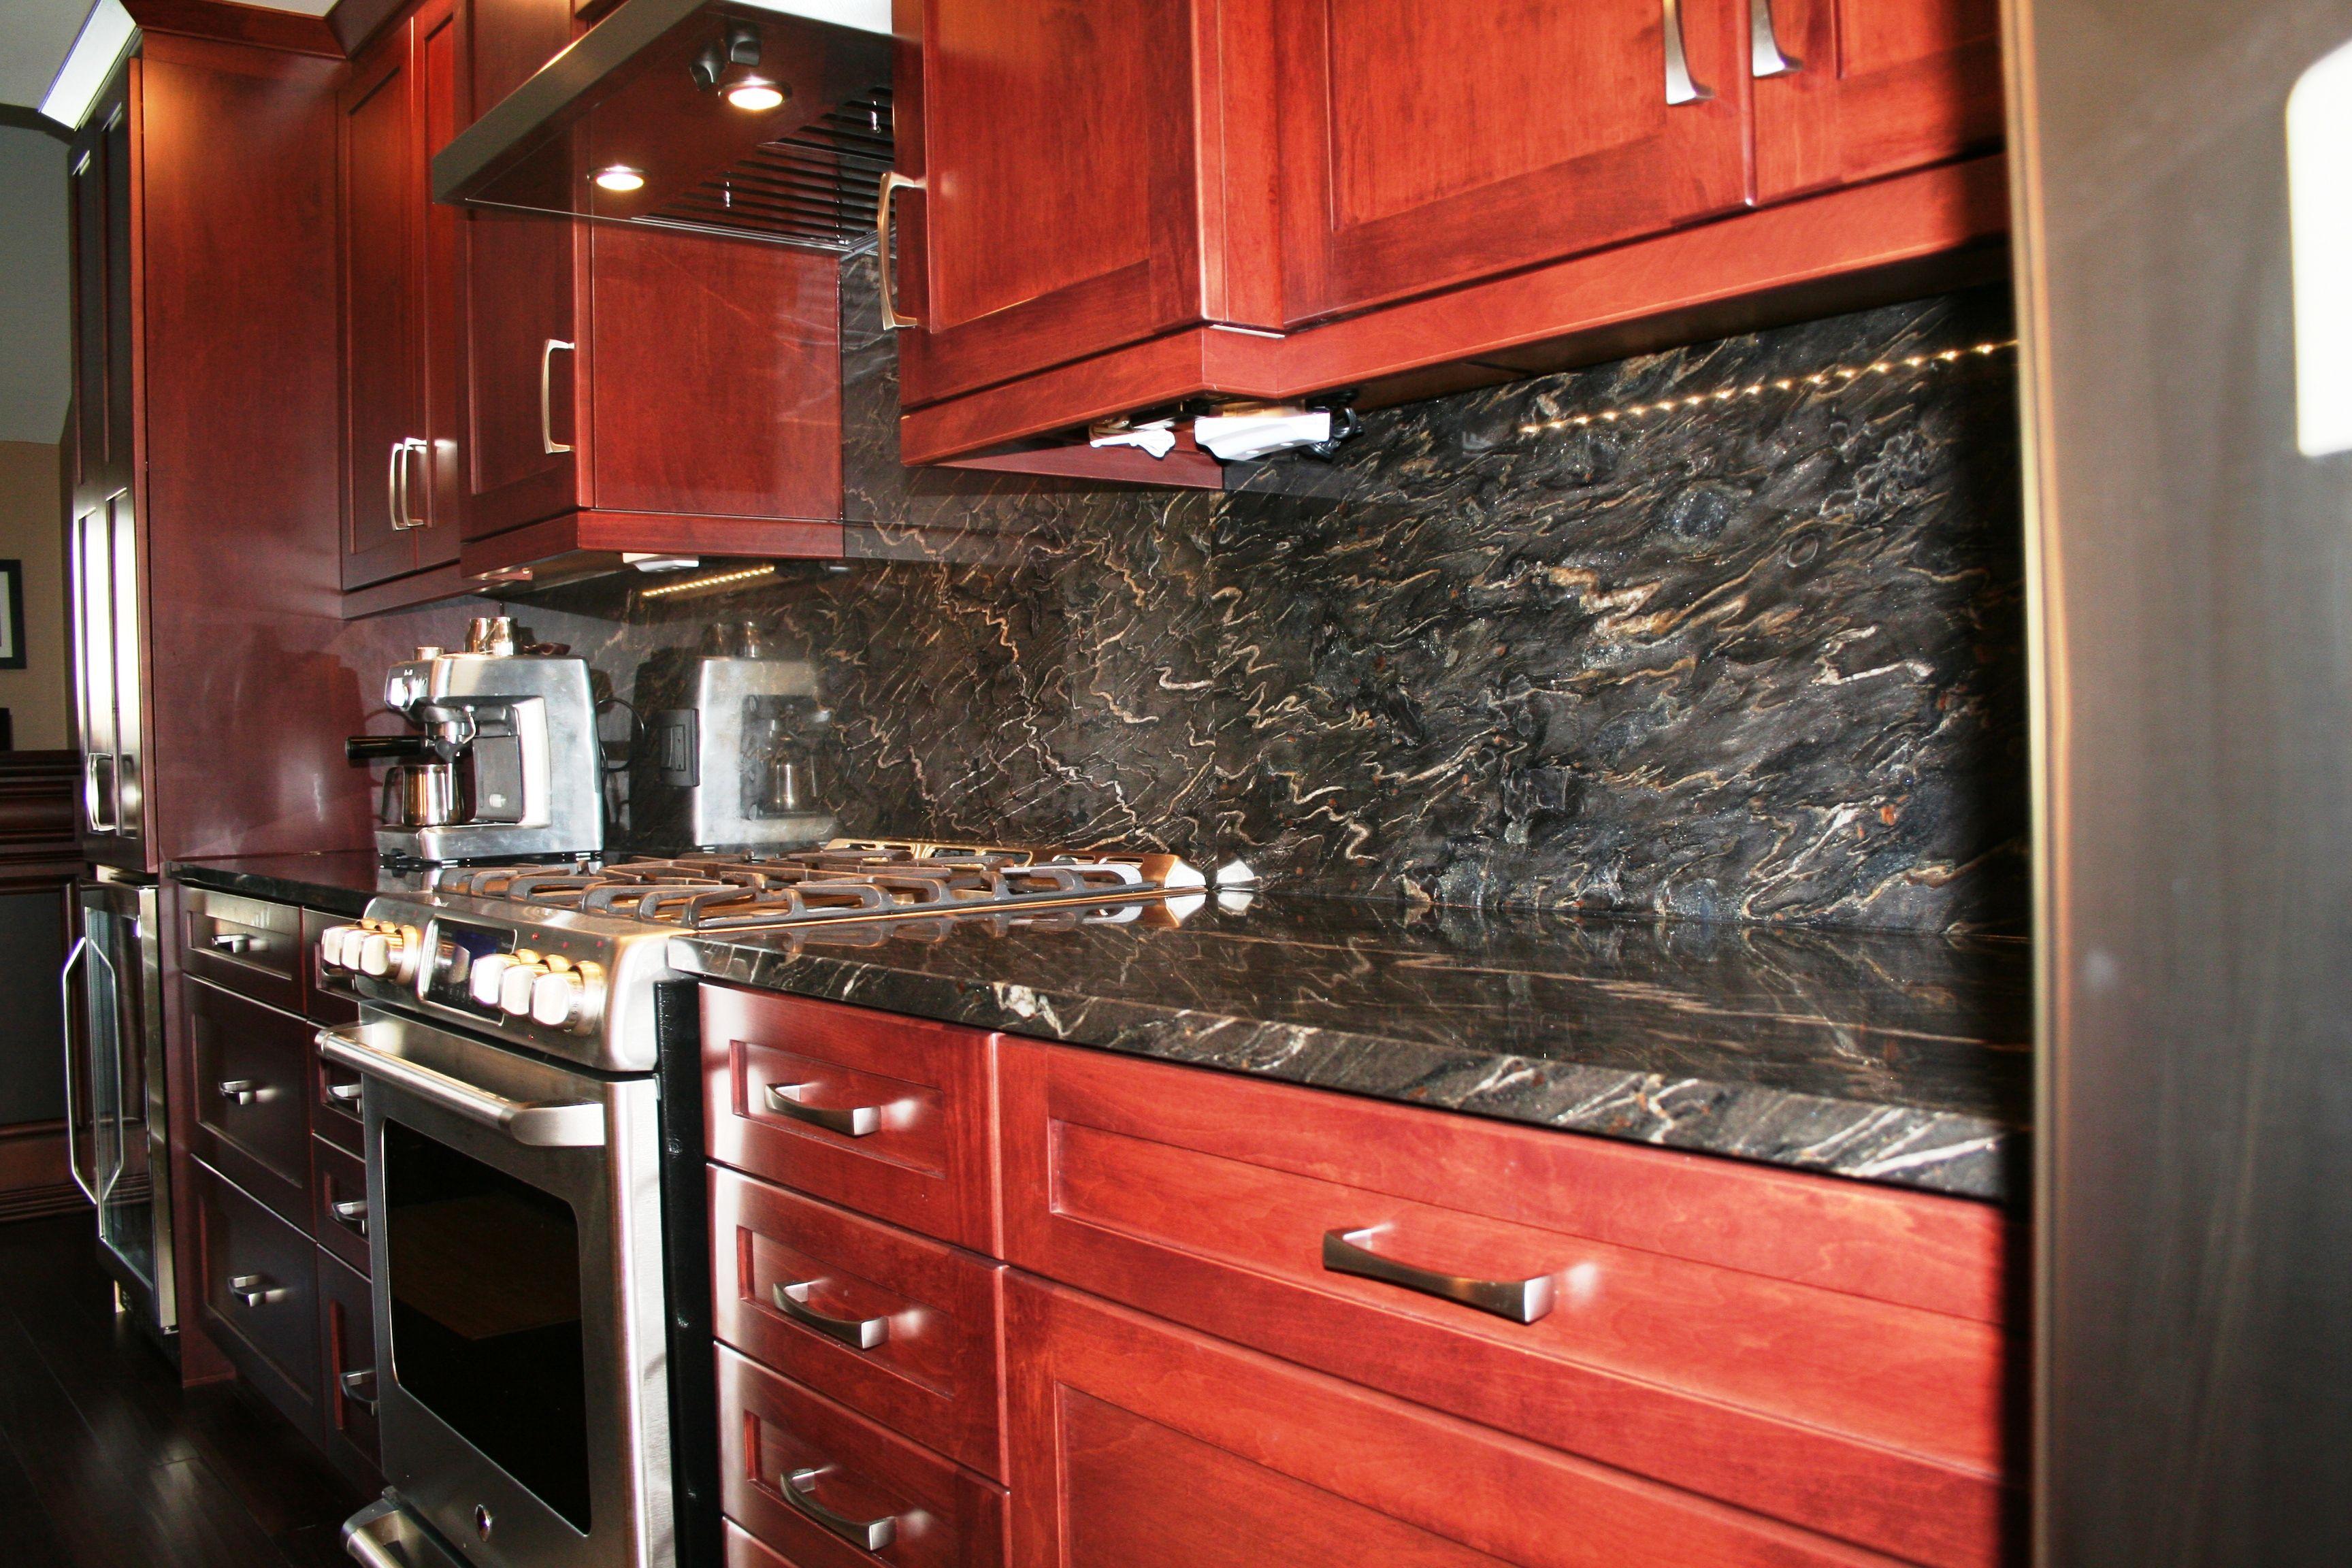 Granite Windsor Ontario - Twilight Granite Kitchen Countertop and Full Backsplash -- Dimanti Stone Works & Granite Windsor Ontario - Twilight Granite Kitchen Countertop and ...